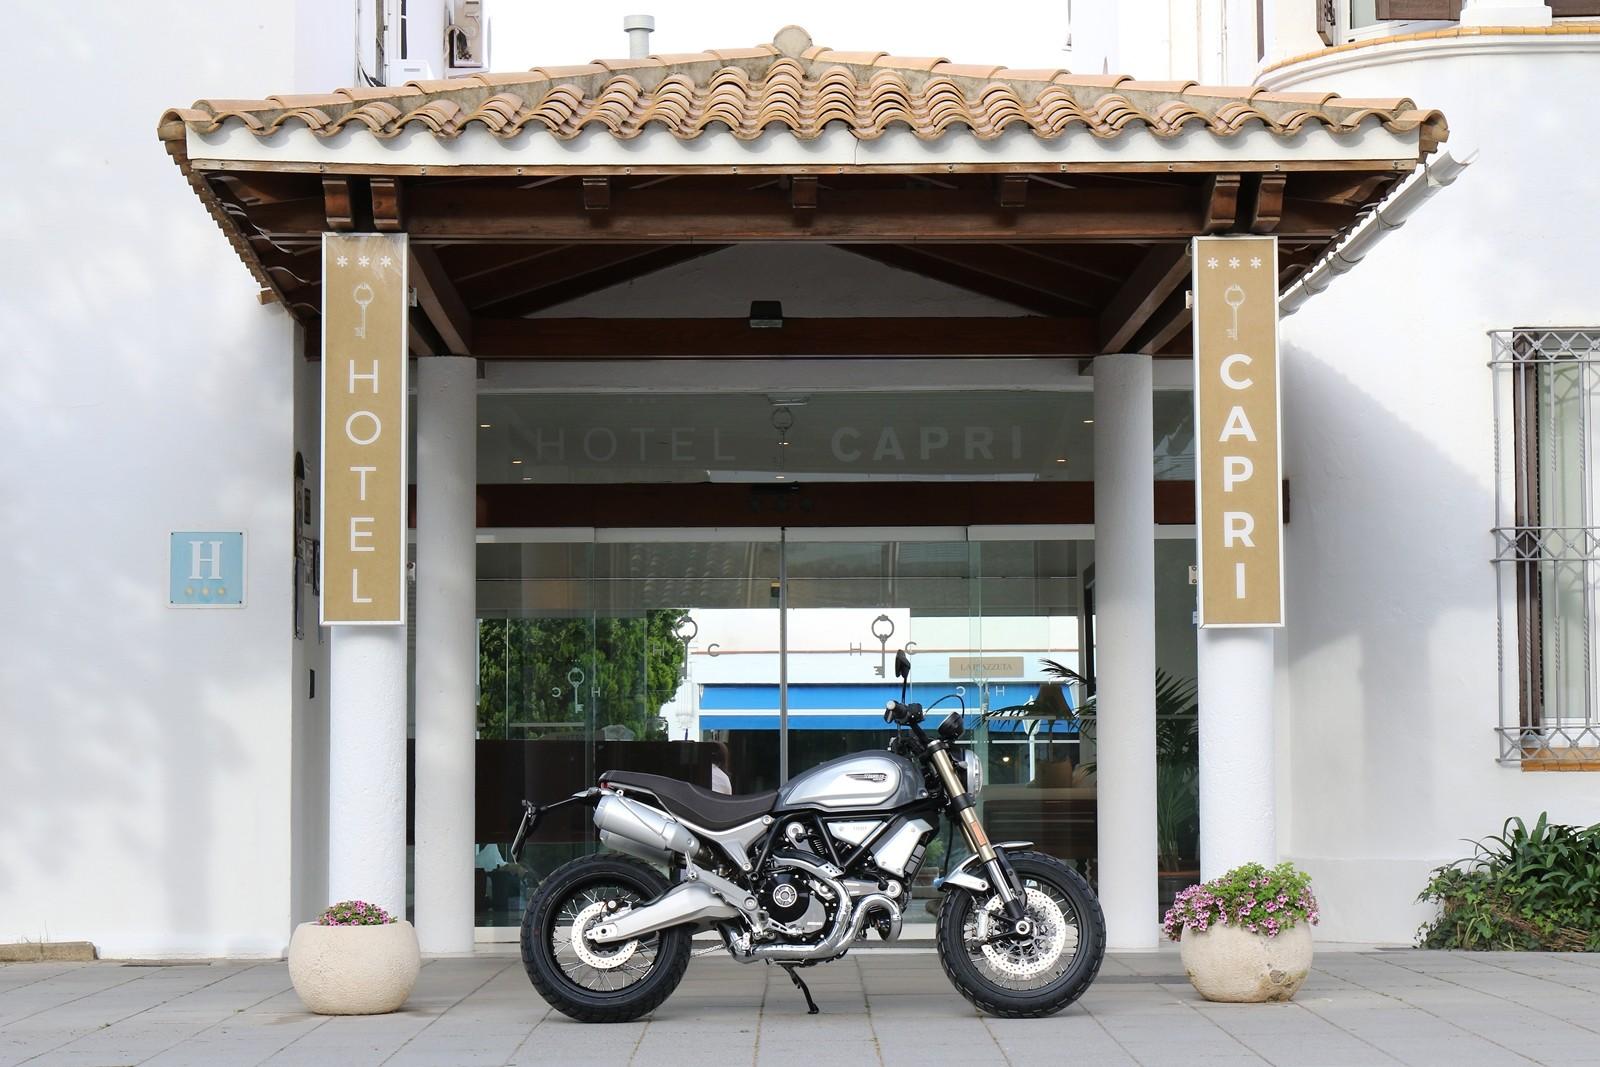 Foto de Ducati Scrambler 1100 2018, prueba (35/35)